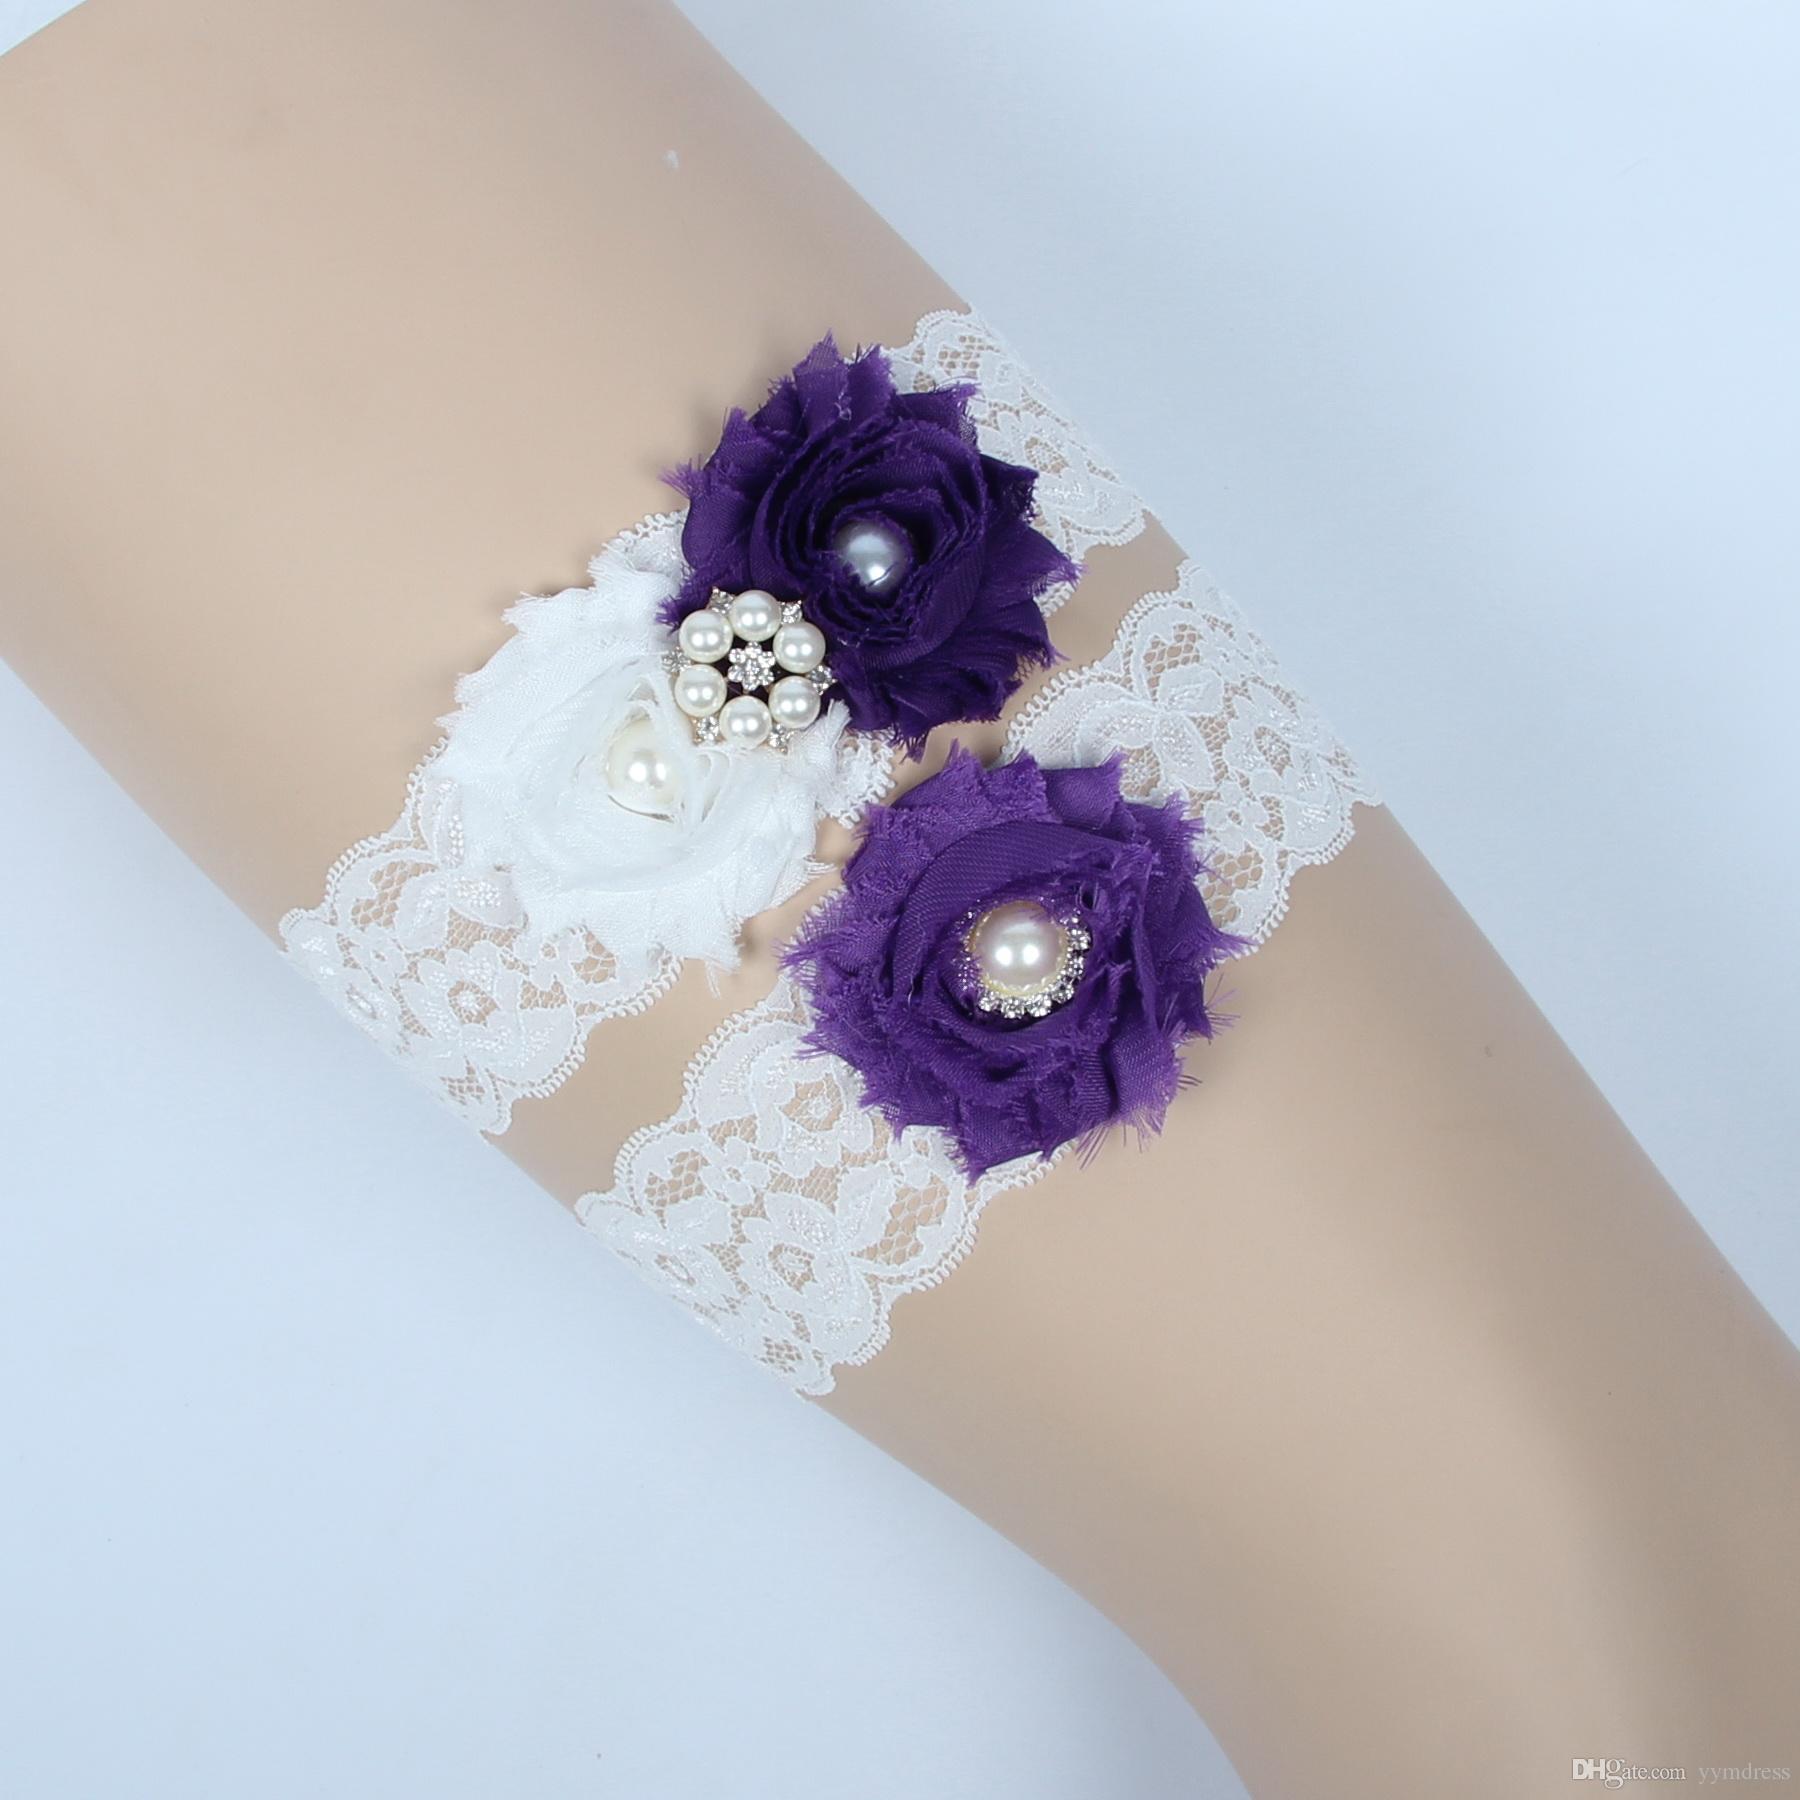 eb856603f8d Vintage Bridal Garters Prom Garter Bridal Wedding Garter Set Purple Lace  Rhinestones Pearls Crystals In Stock Cheap Plus Size Petticoat Slip Dress  ...